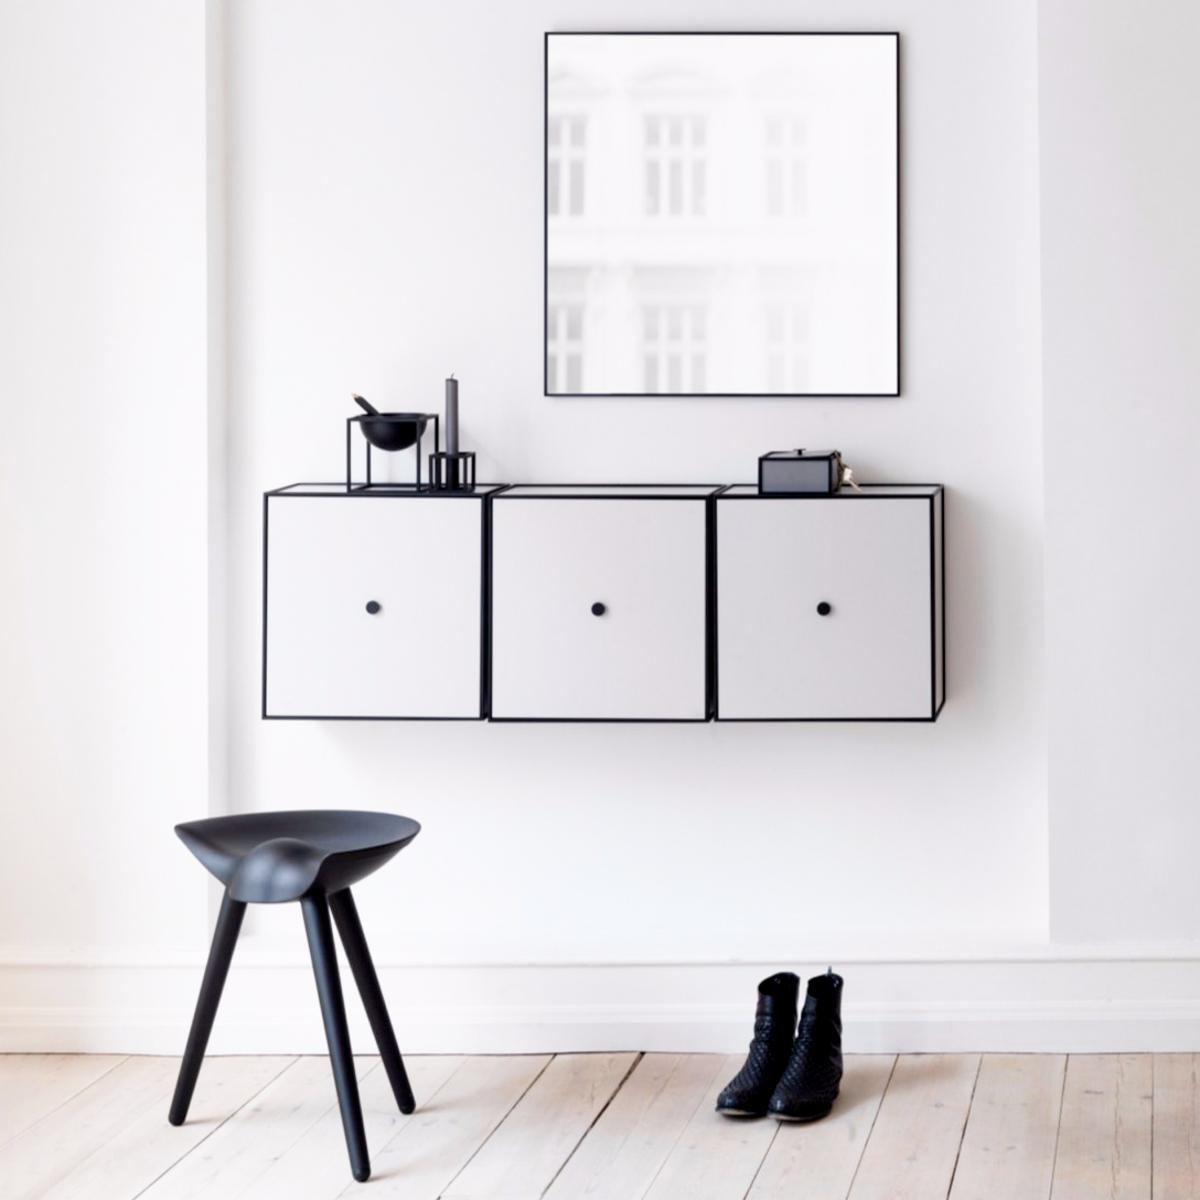 Frame Case By Lassen Minimalist Storage | Scandinavia Standard